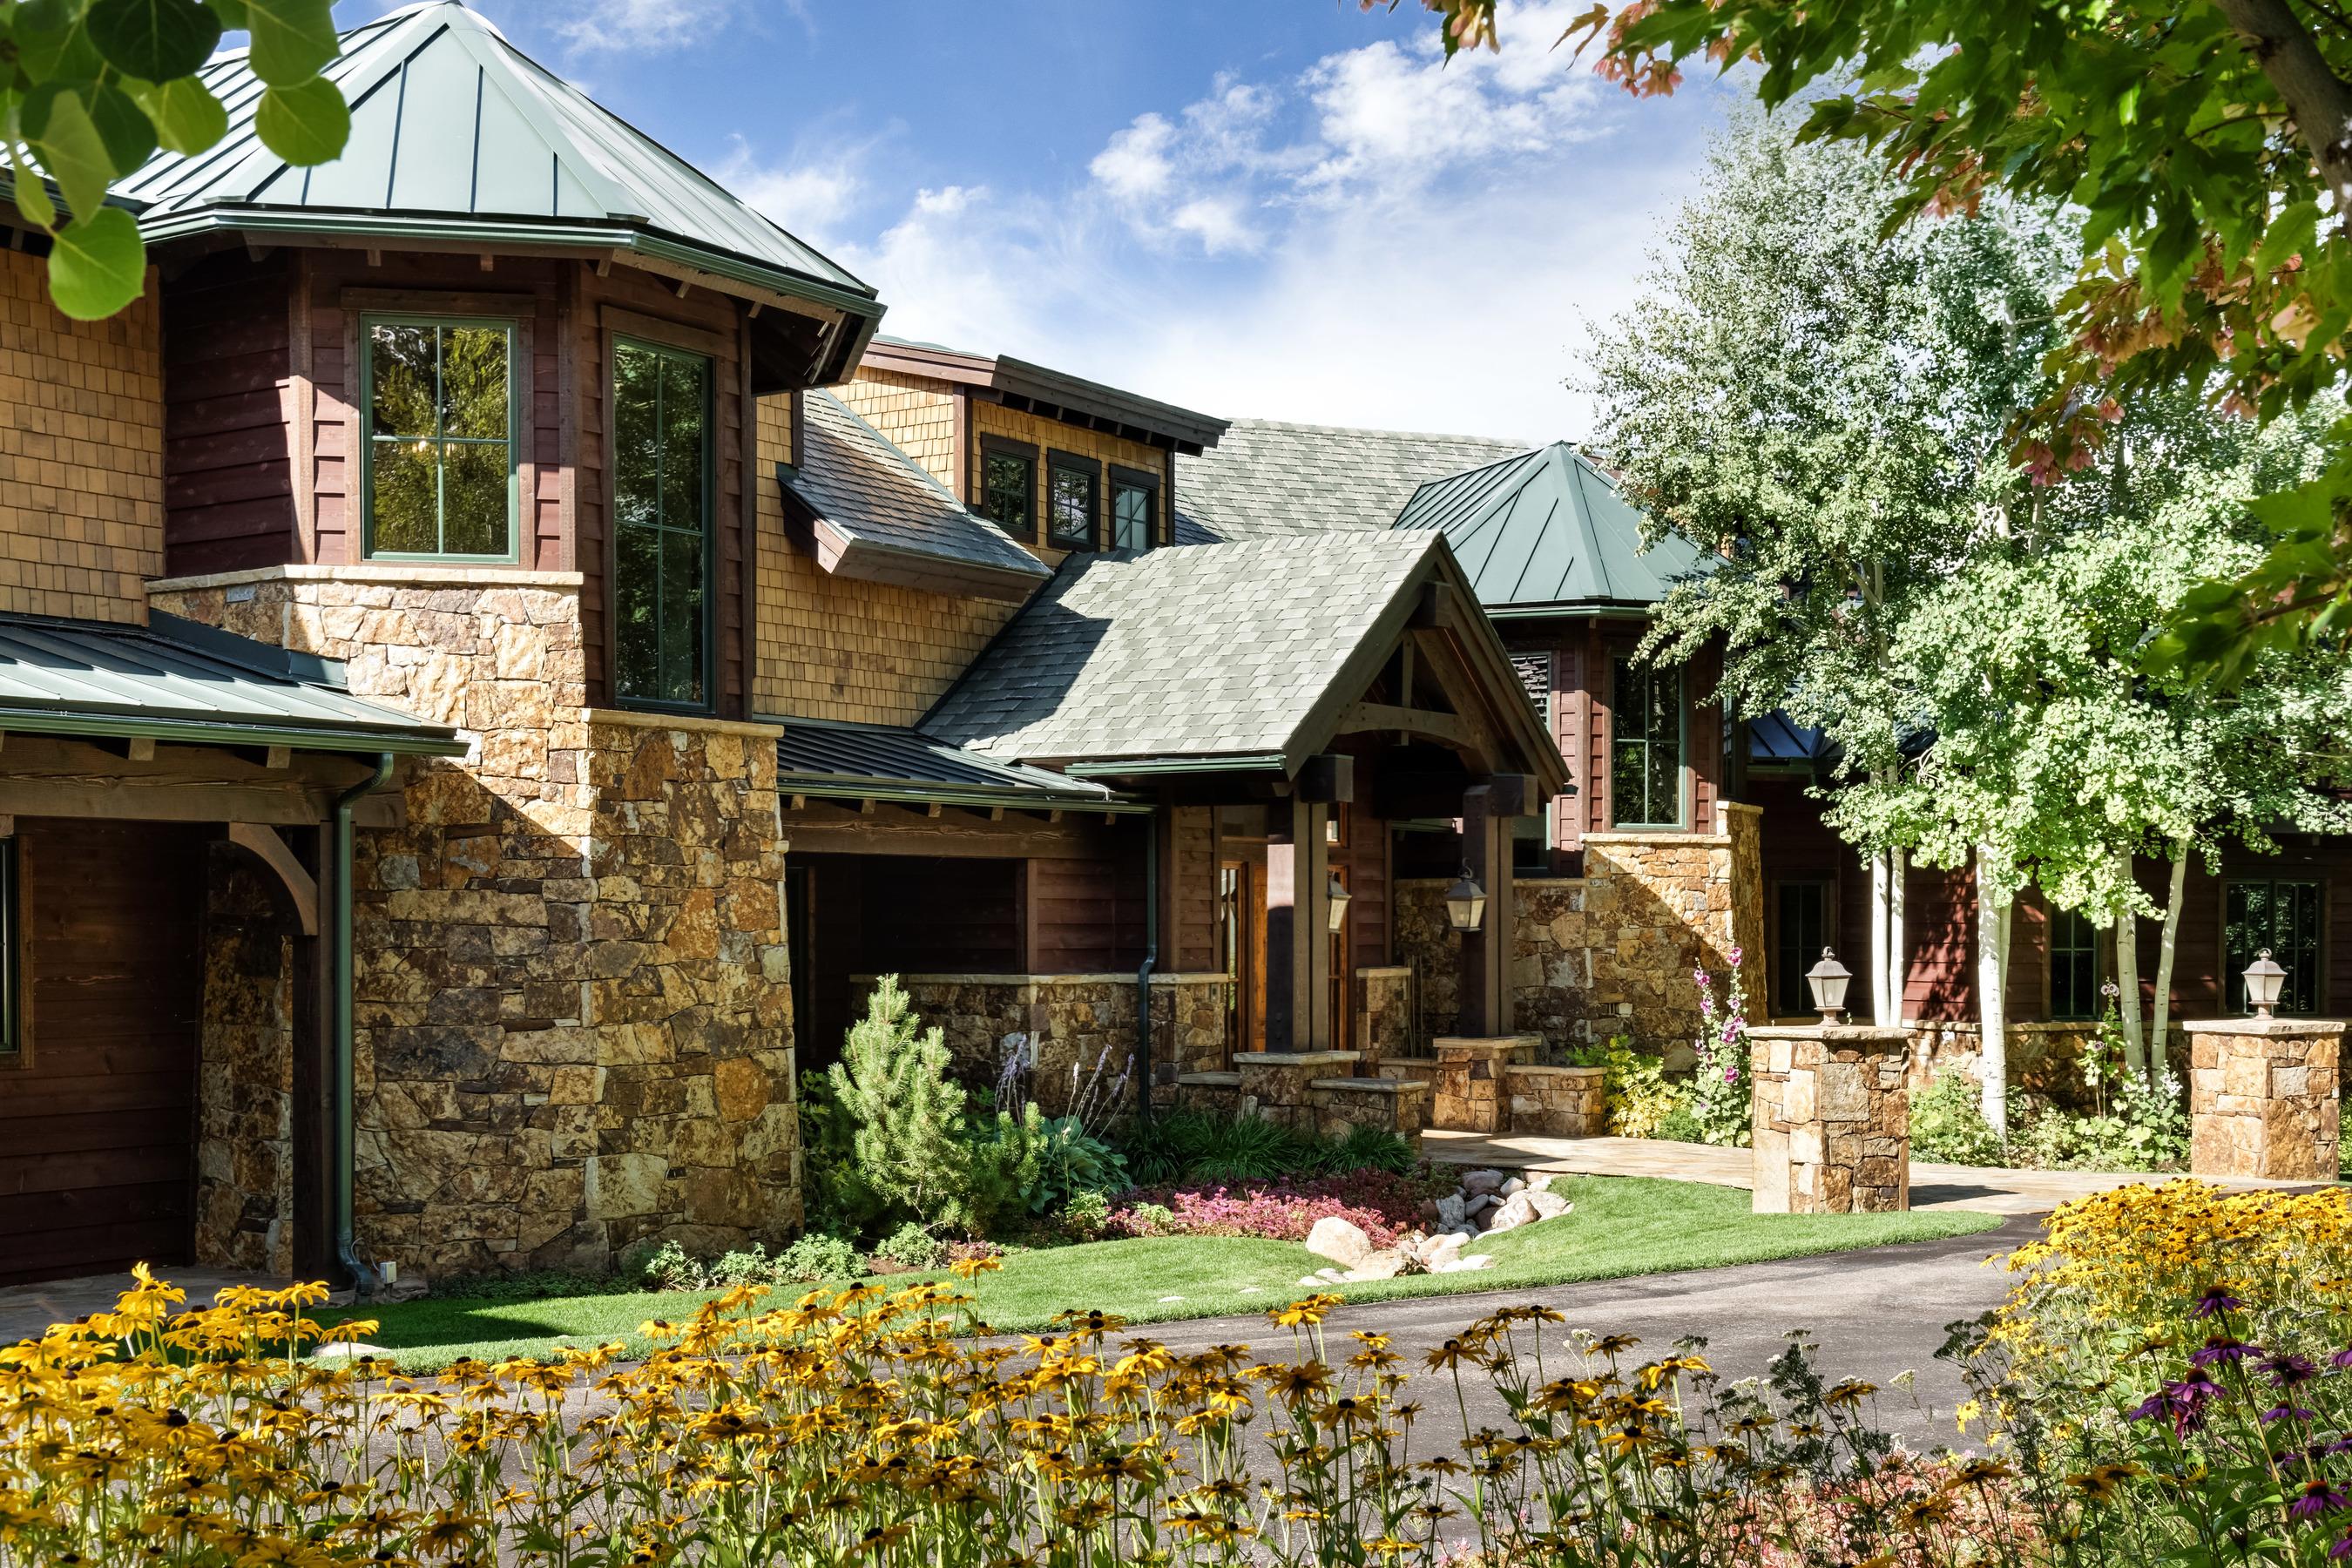 獨棟家庭住宅 為 出售 在 Magnificent Panorama in McLain Flats 2016 McLain Flats Road Aspen, 科羅拉多州, 81611 美國